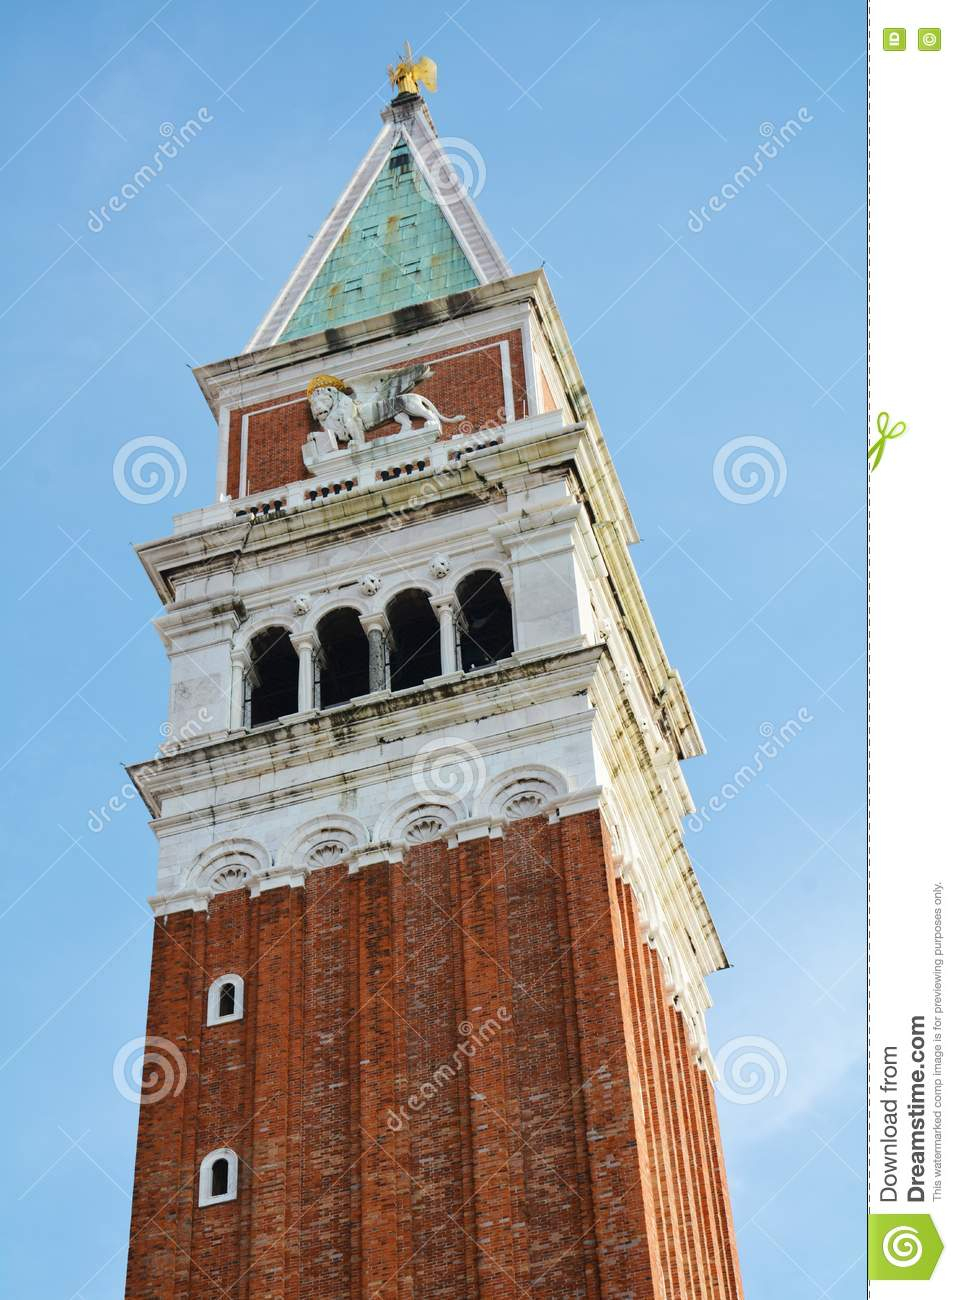 St Mark U. X27; S-Quadrat Und Der Berühmte Turm, Venedig ganzes Berühmte Türme